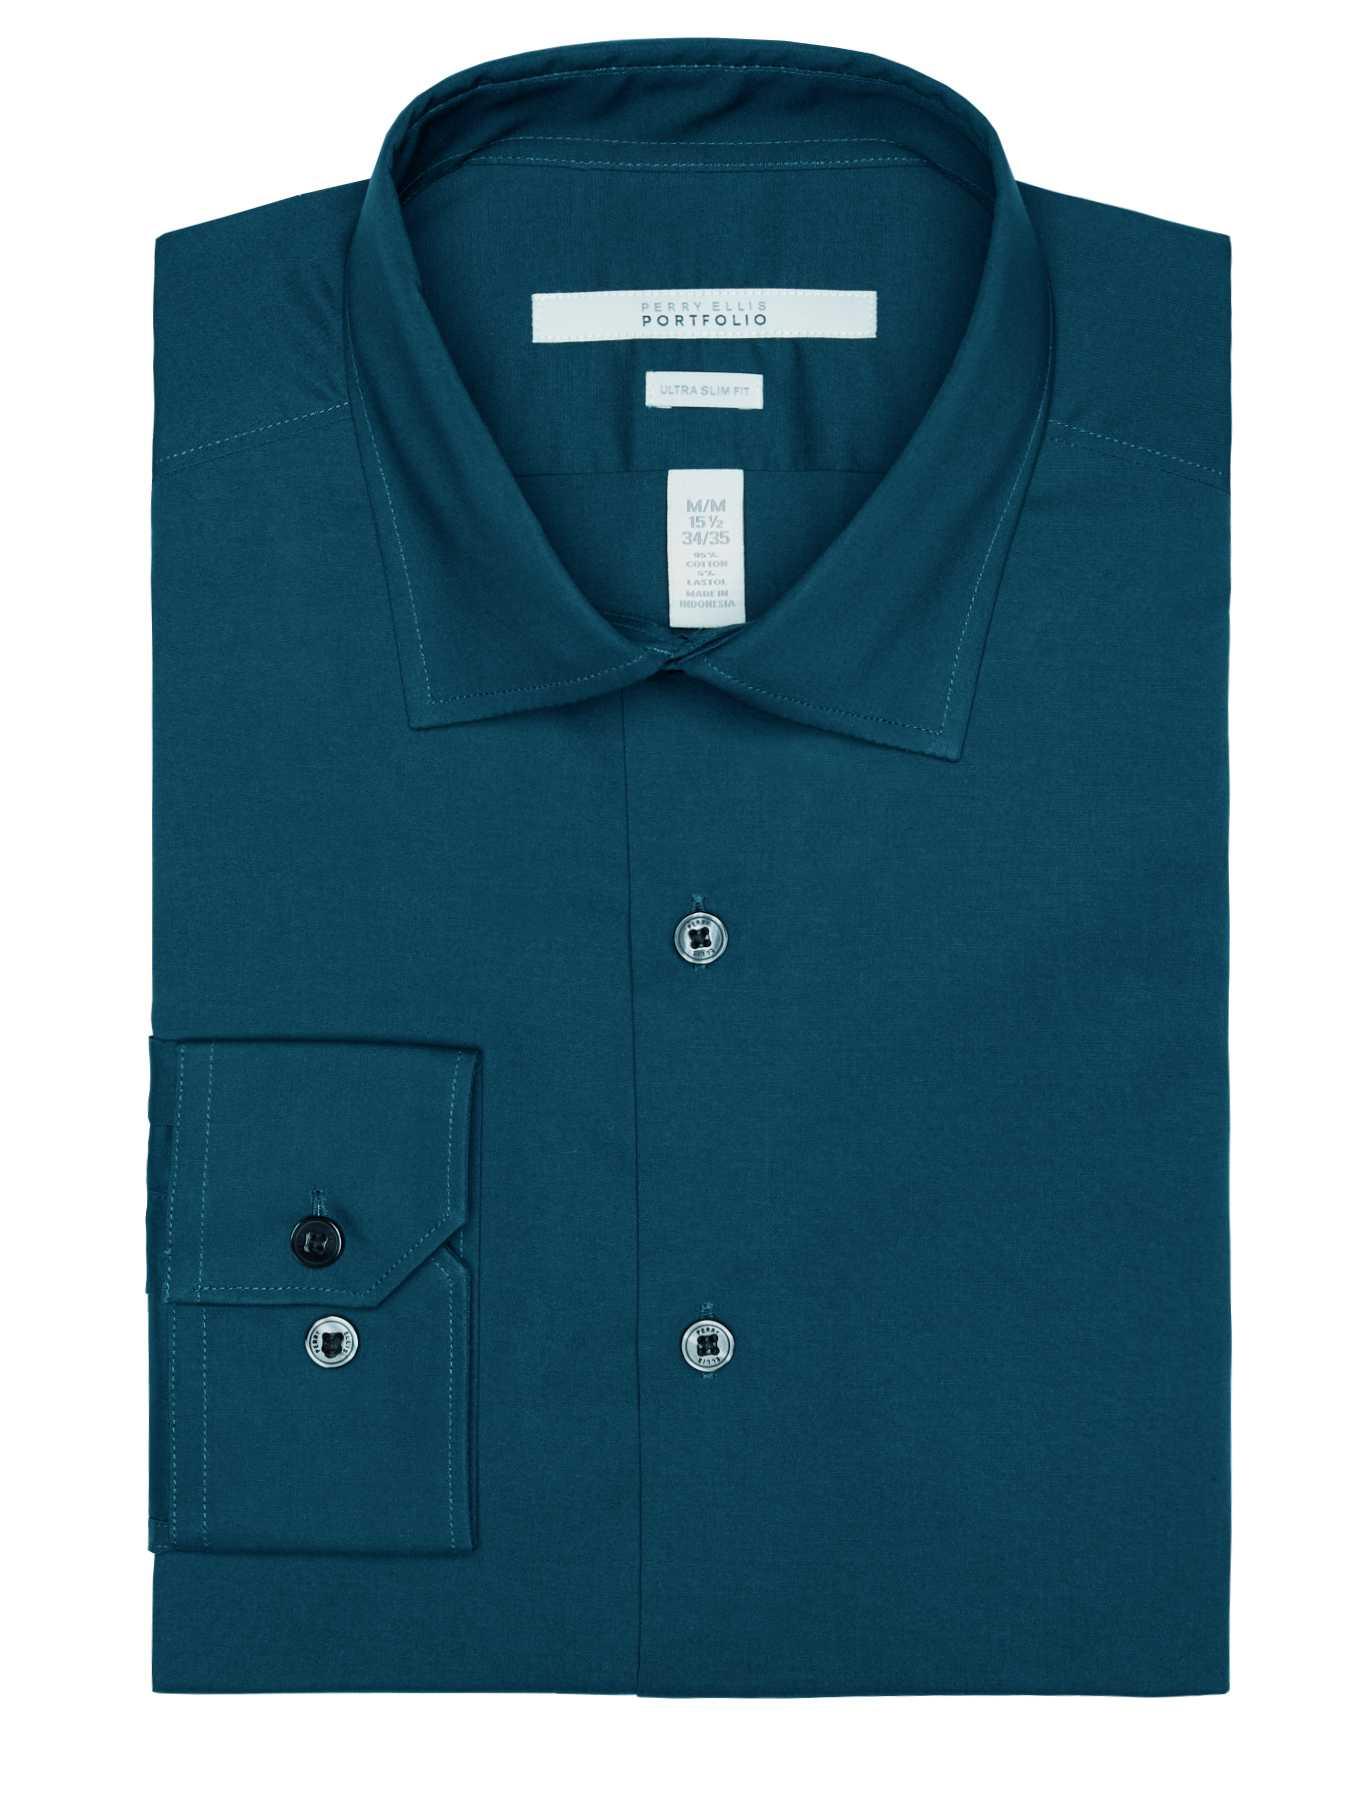 Perry Ellis Ultra Slim Solid Dress Shirt